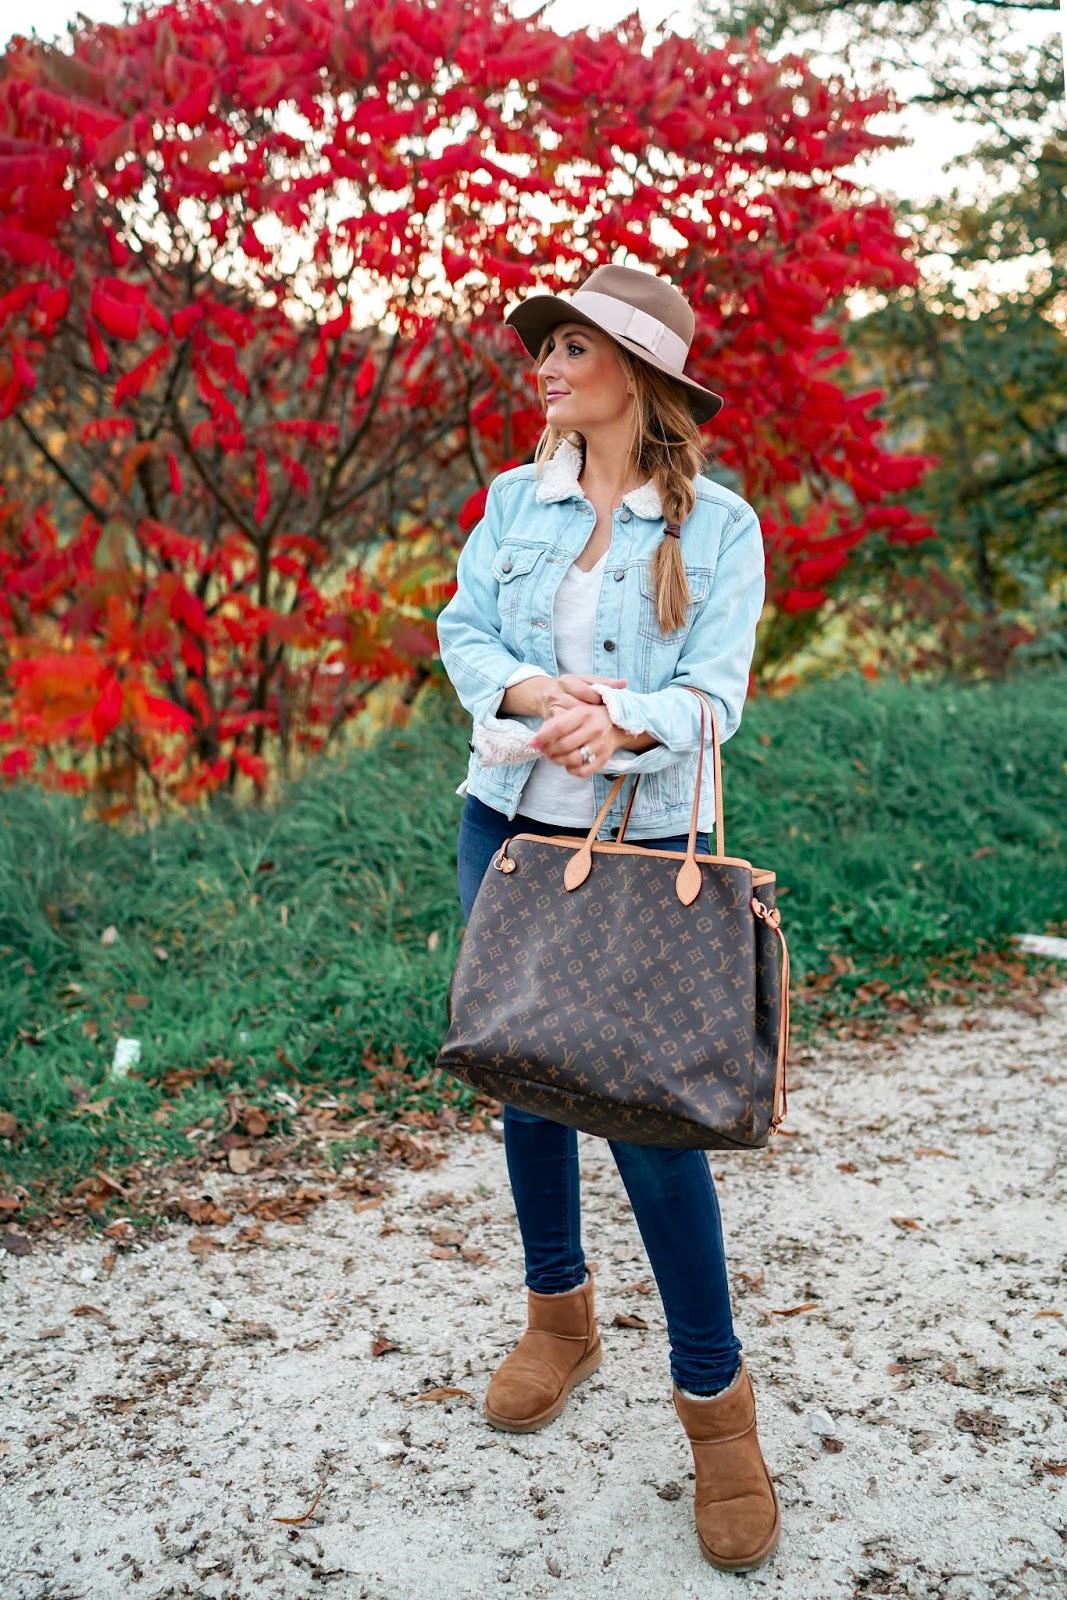 Fashionstylebyjohanna-Ugg-Boots-in-braun-Herbstoutfit-fedora-hut-filzhut-kombinieren-Louis-vuitton-tasche-neverfull-GM